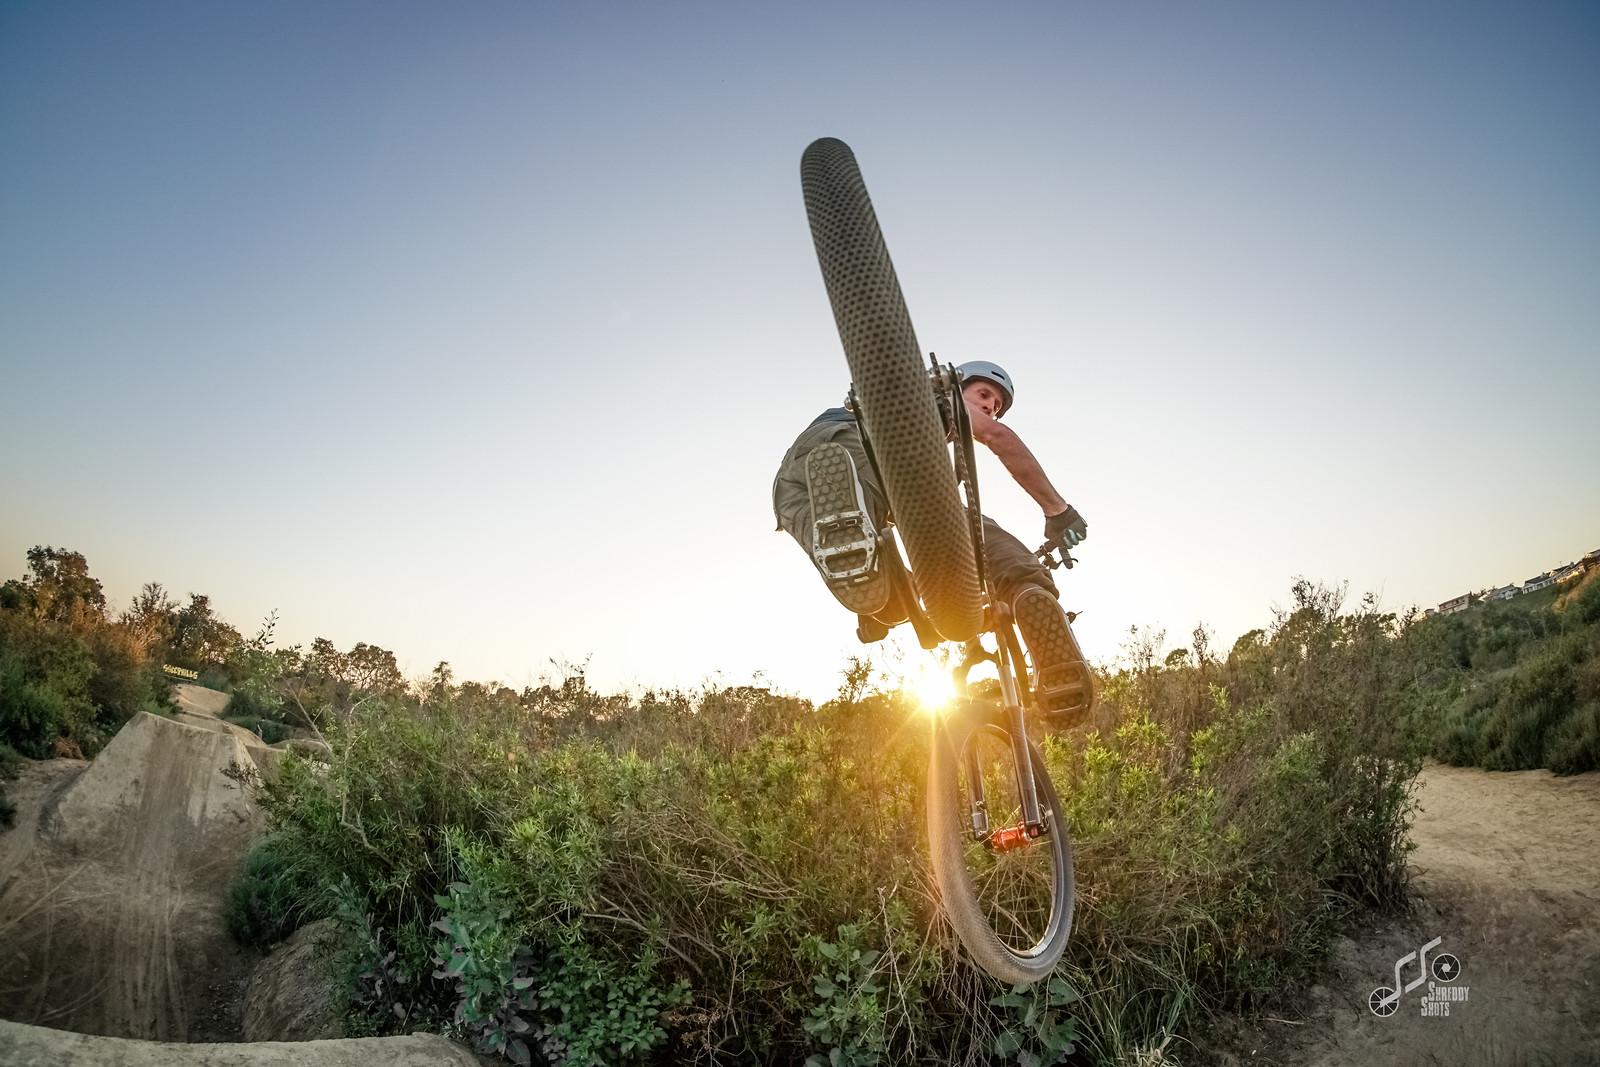 Brian all rear tire - shreddyshots - Mountain Biking Pictures - Vital MTB